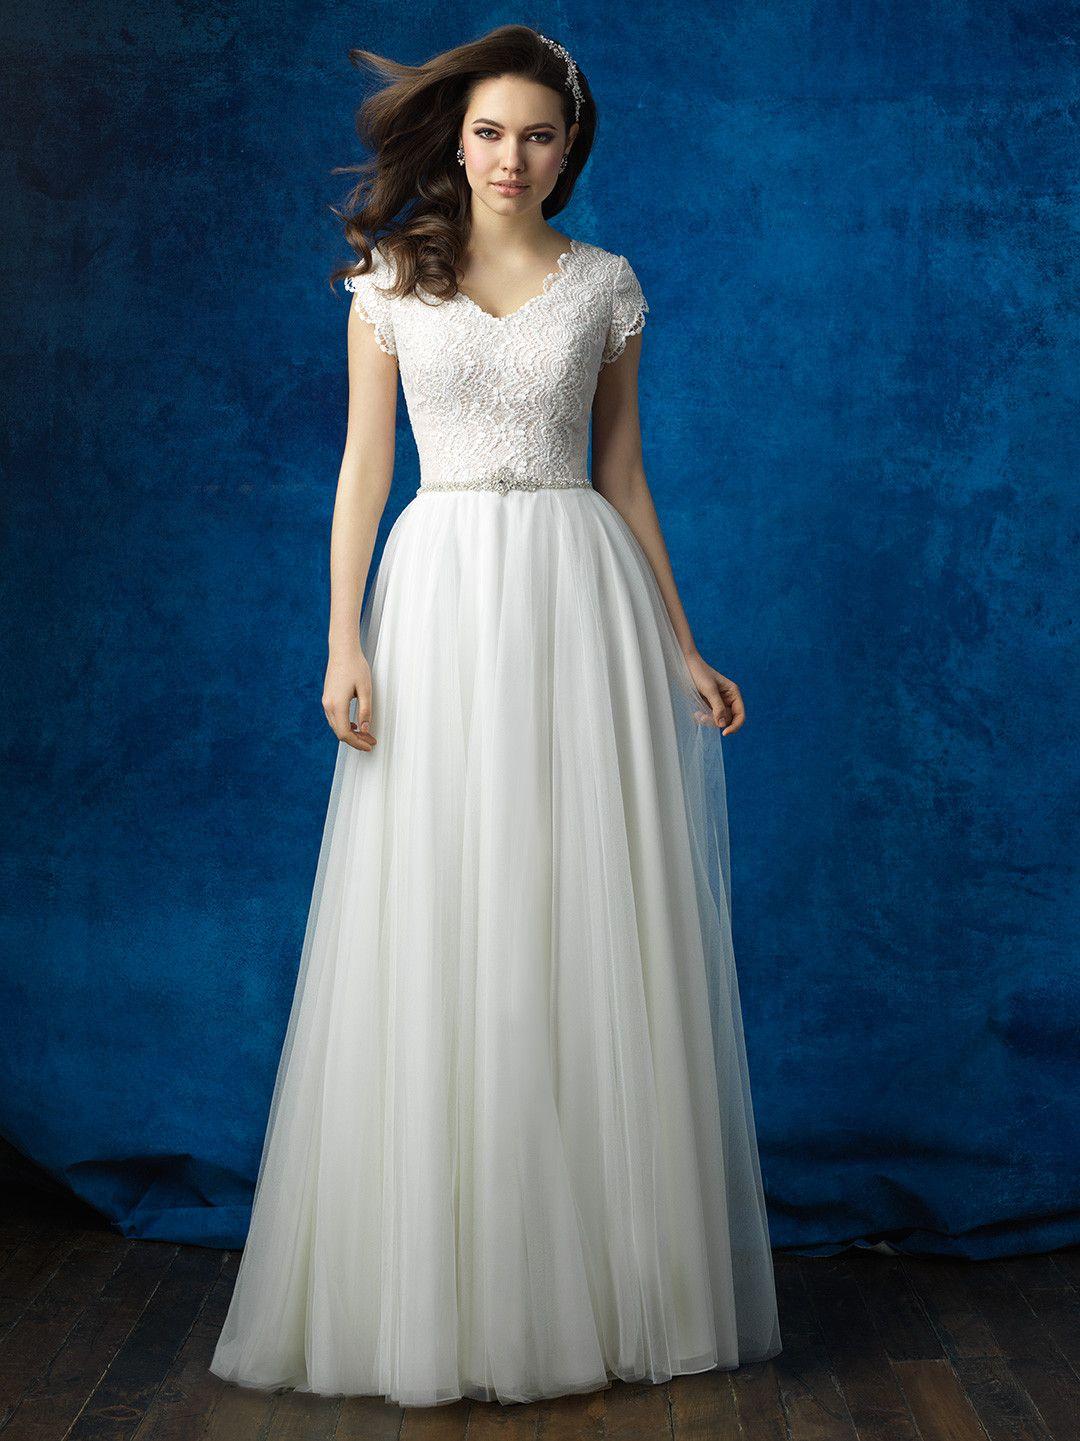 Allure Modest M564 Cap Sleeve Lace Bodice Tulle ALine